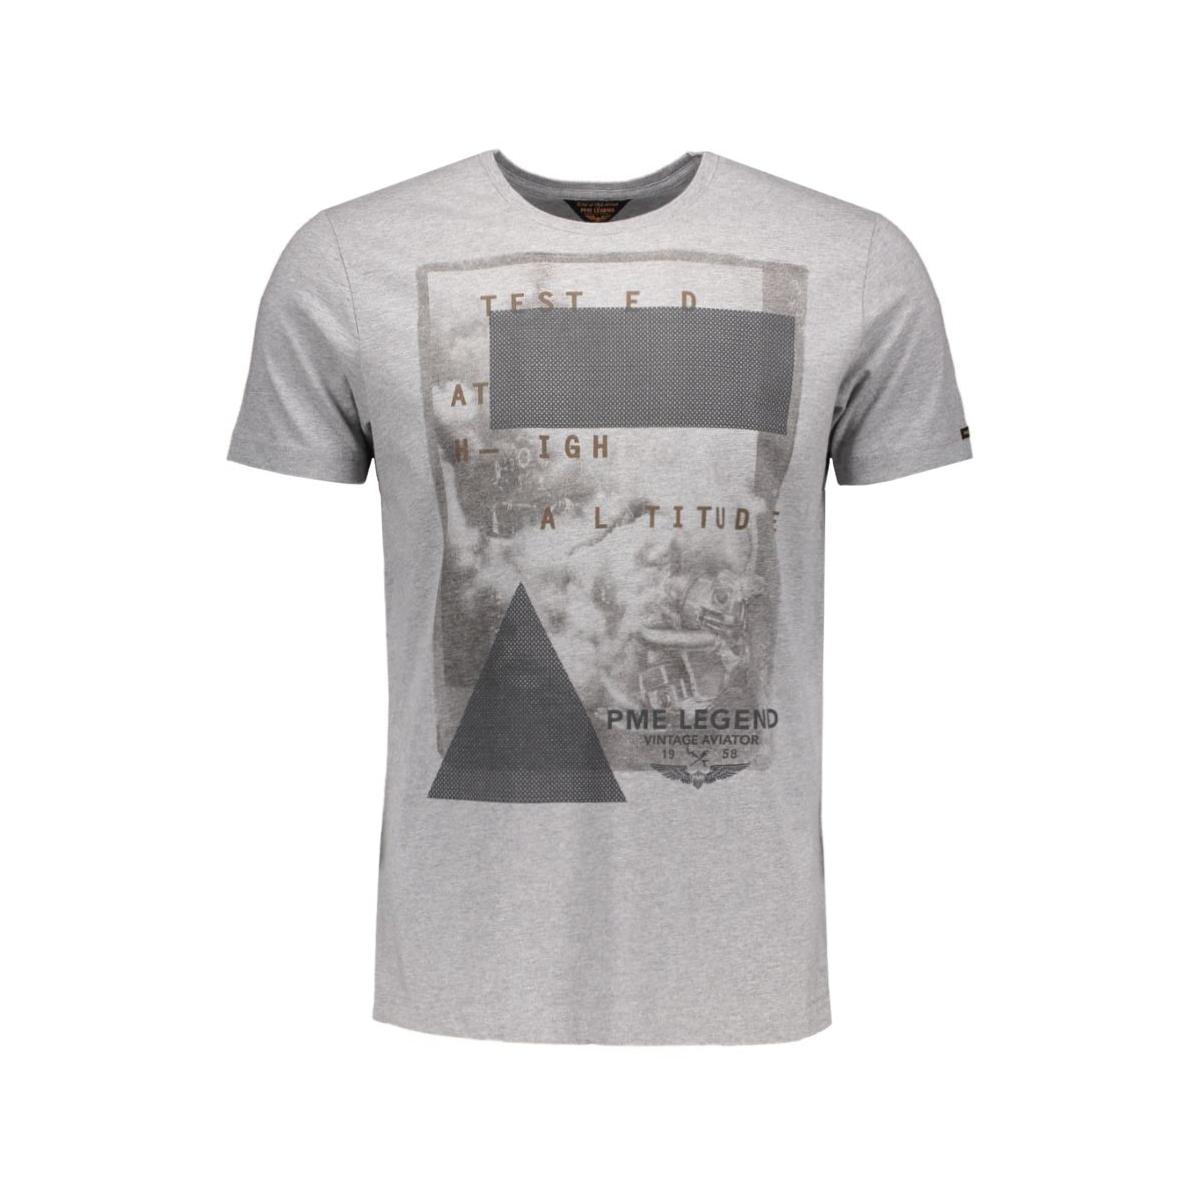 ptss64565-1 pme legend t-shirt 960